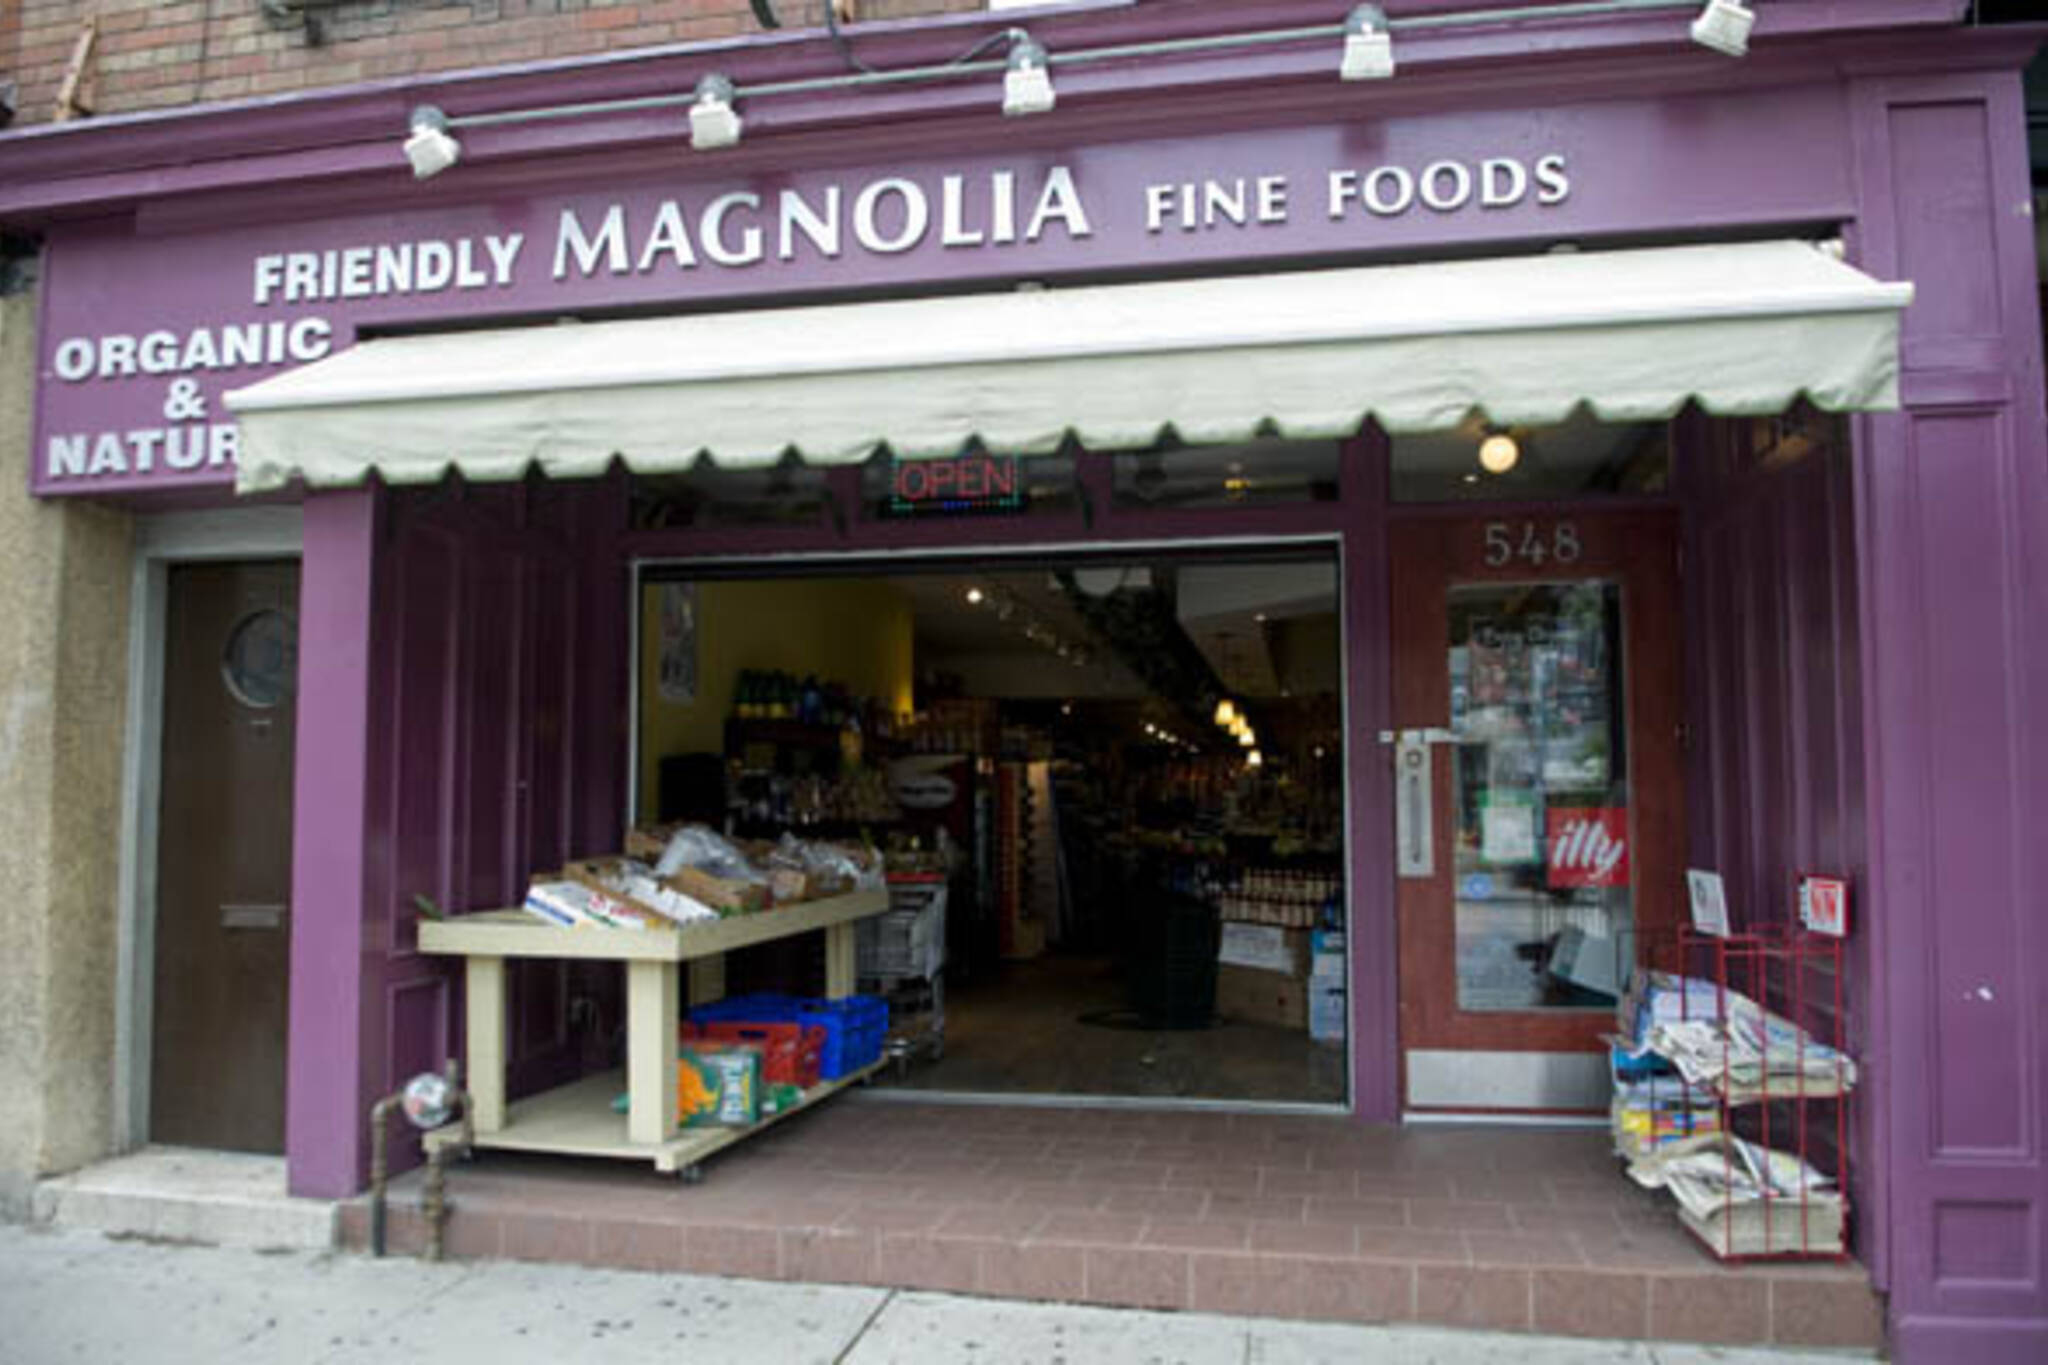 magnoliafinefoods